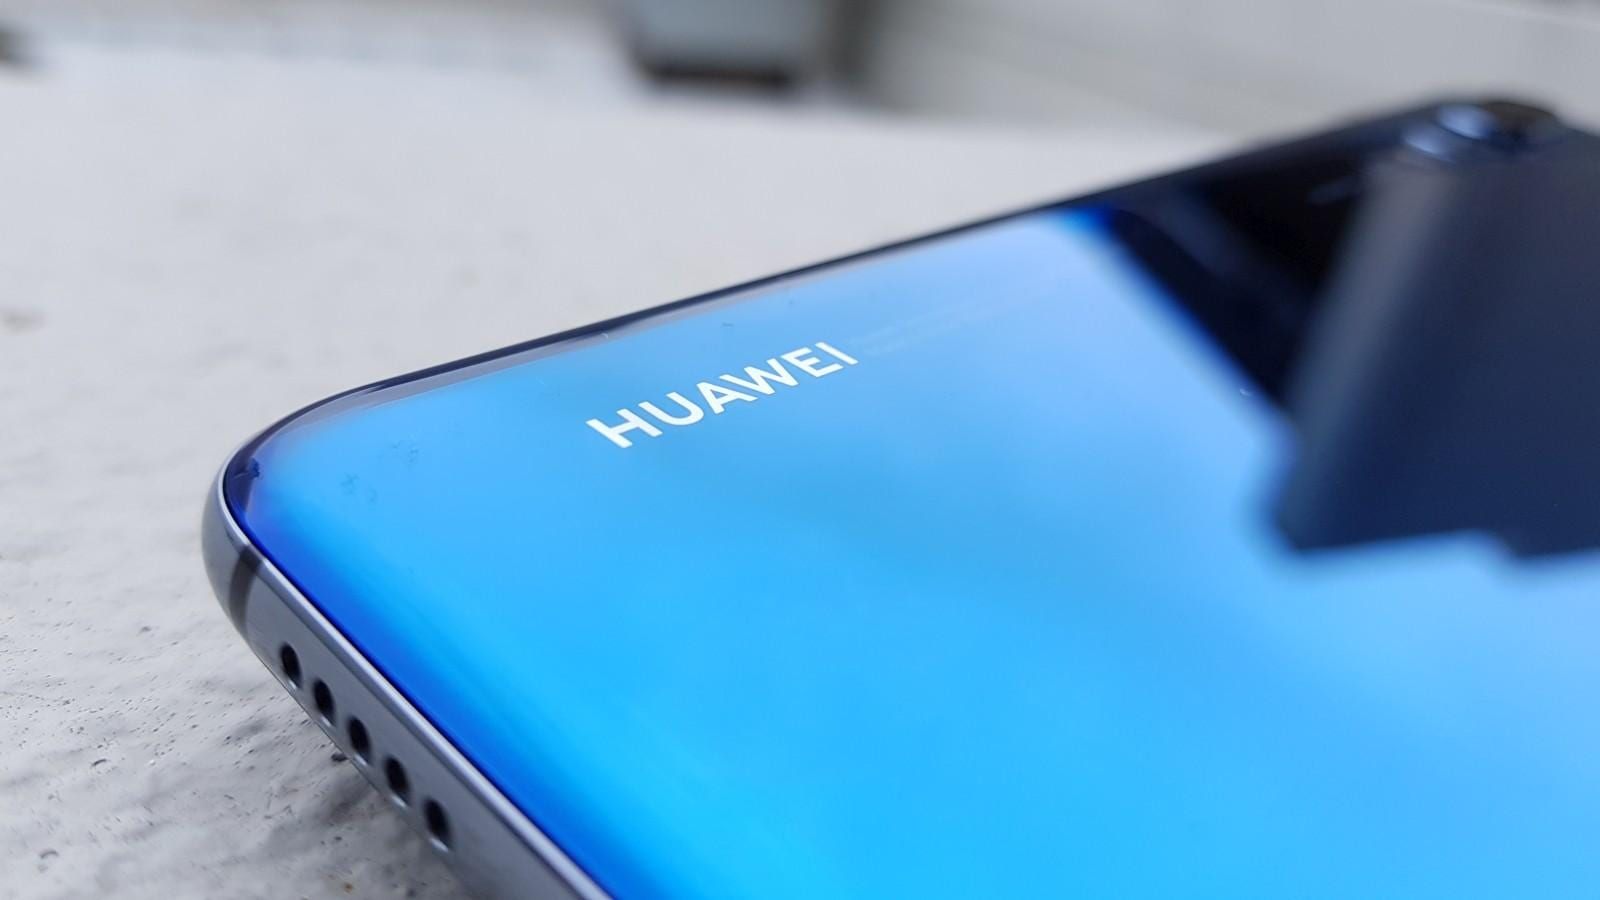 Google приостановит лицензию Huawei на Android в связи с запретом американского правительства (huawei p20 pro review 3)